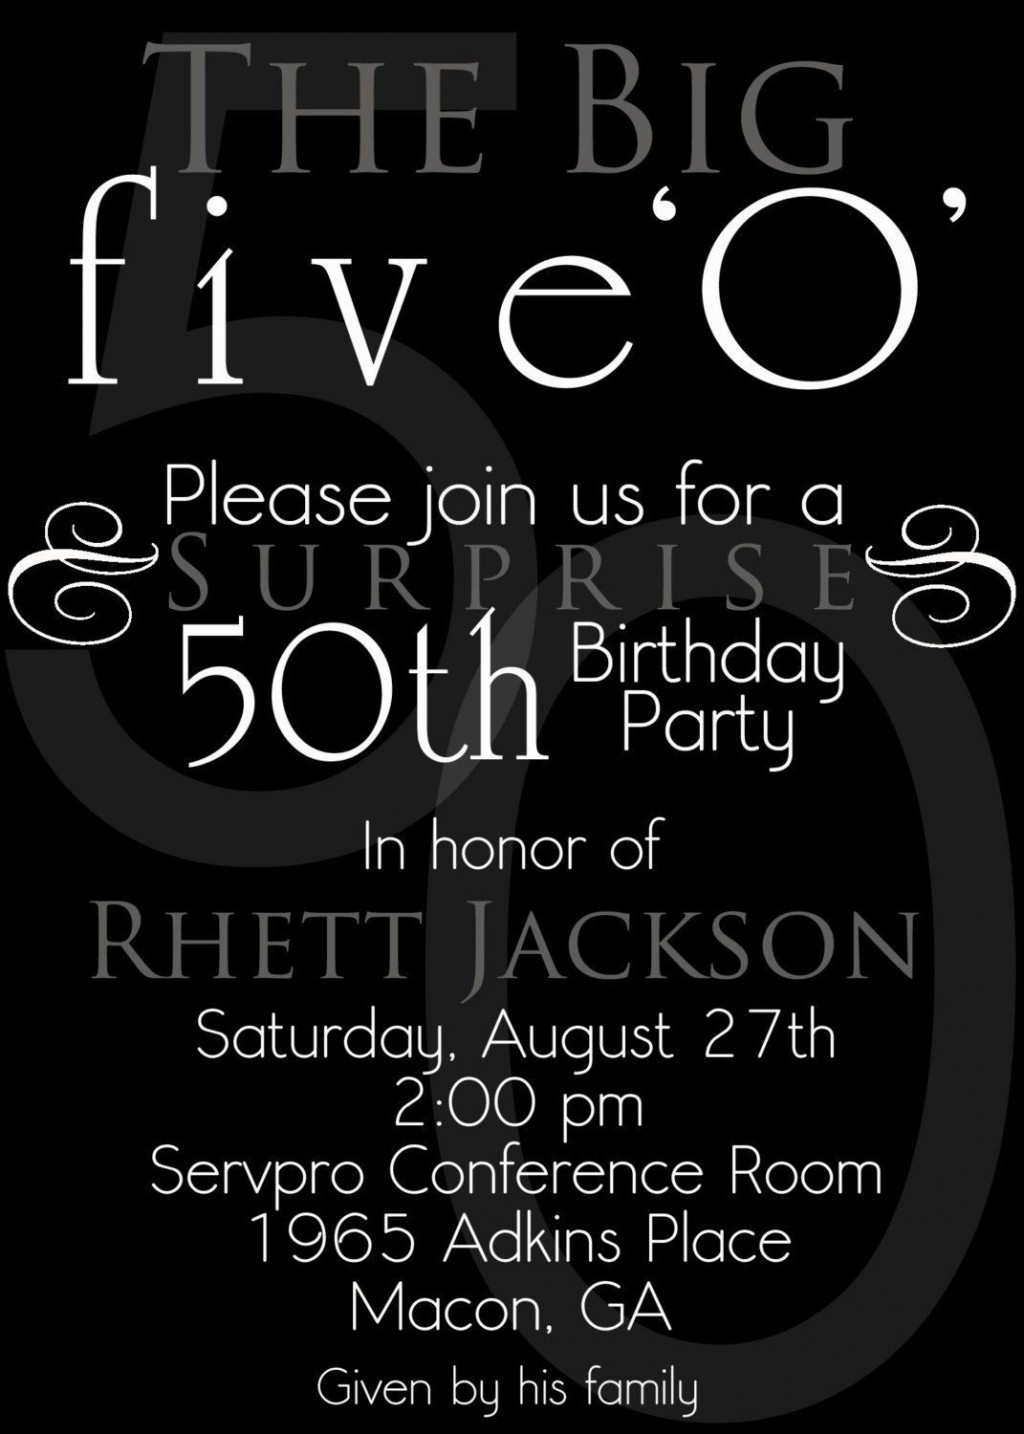 003 Sensational Surprise 50th Birthday Invitation Template Word Free Inspiration Large